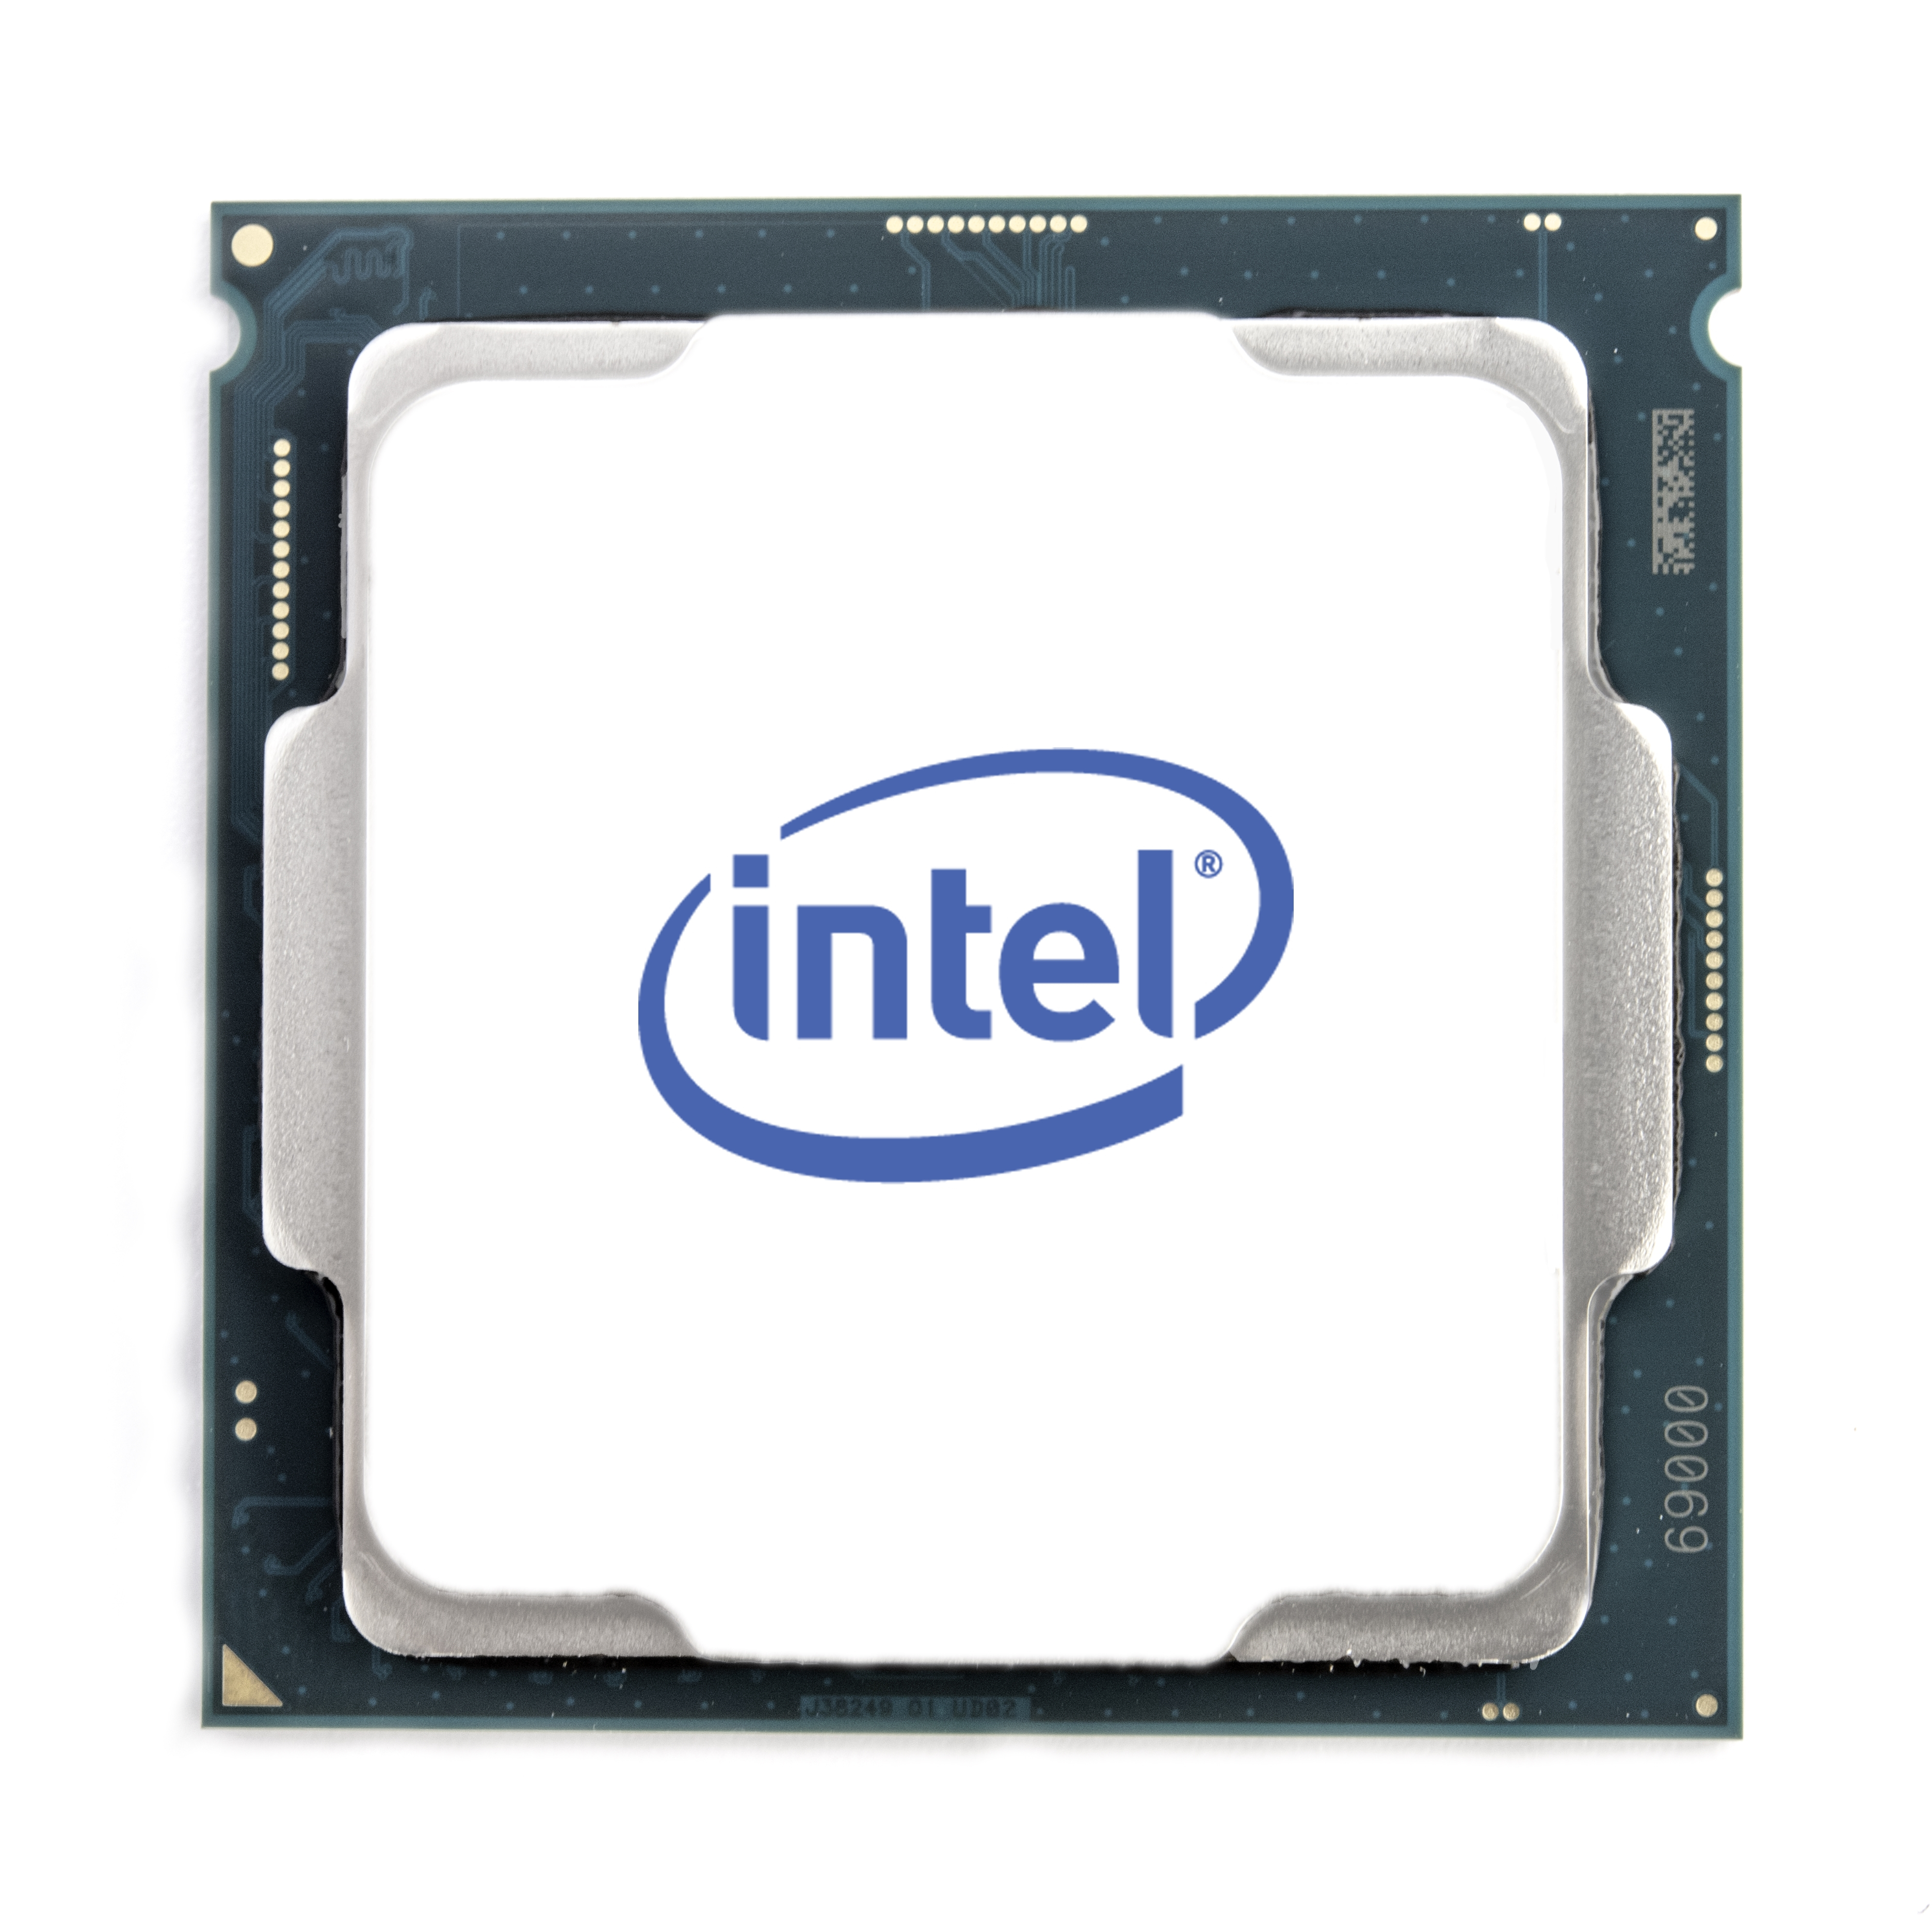 Intel Core i9 10850K - 3.6 GHz - 10 Kerne - 20 Threads